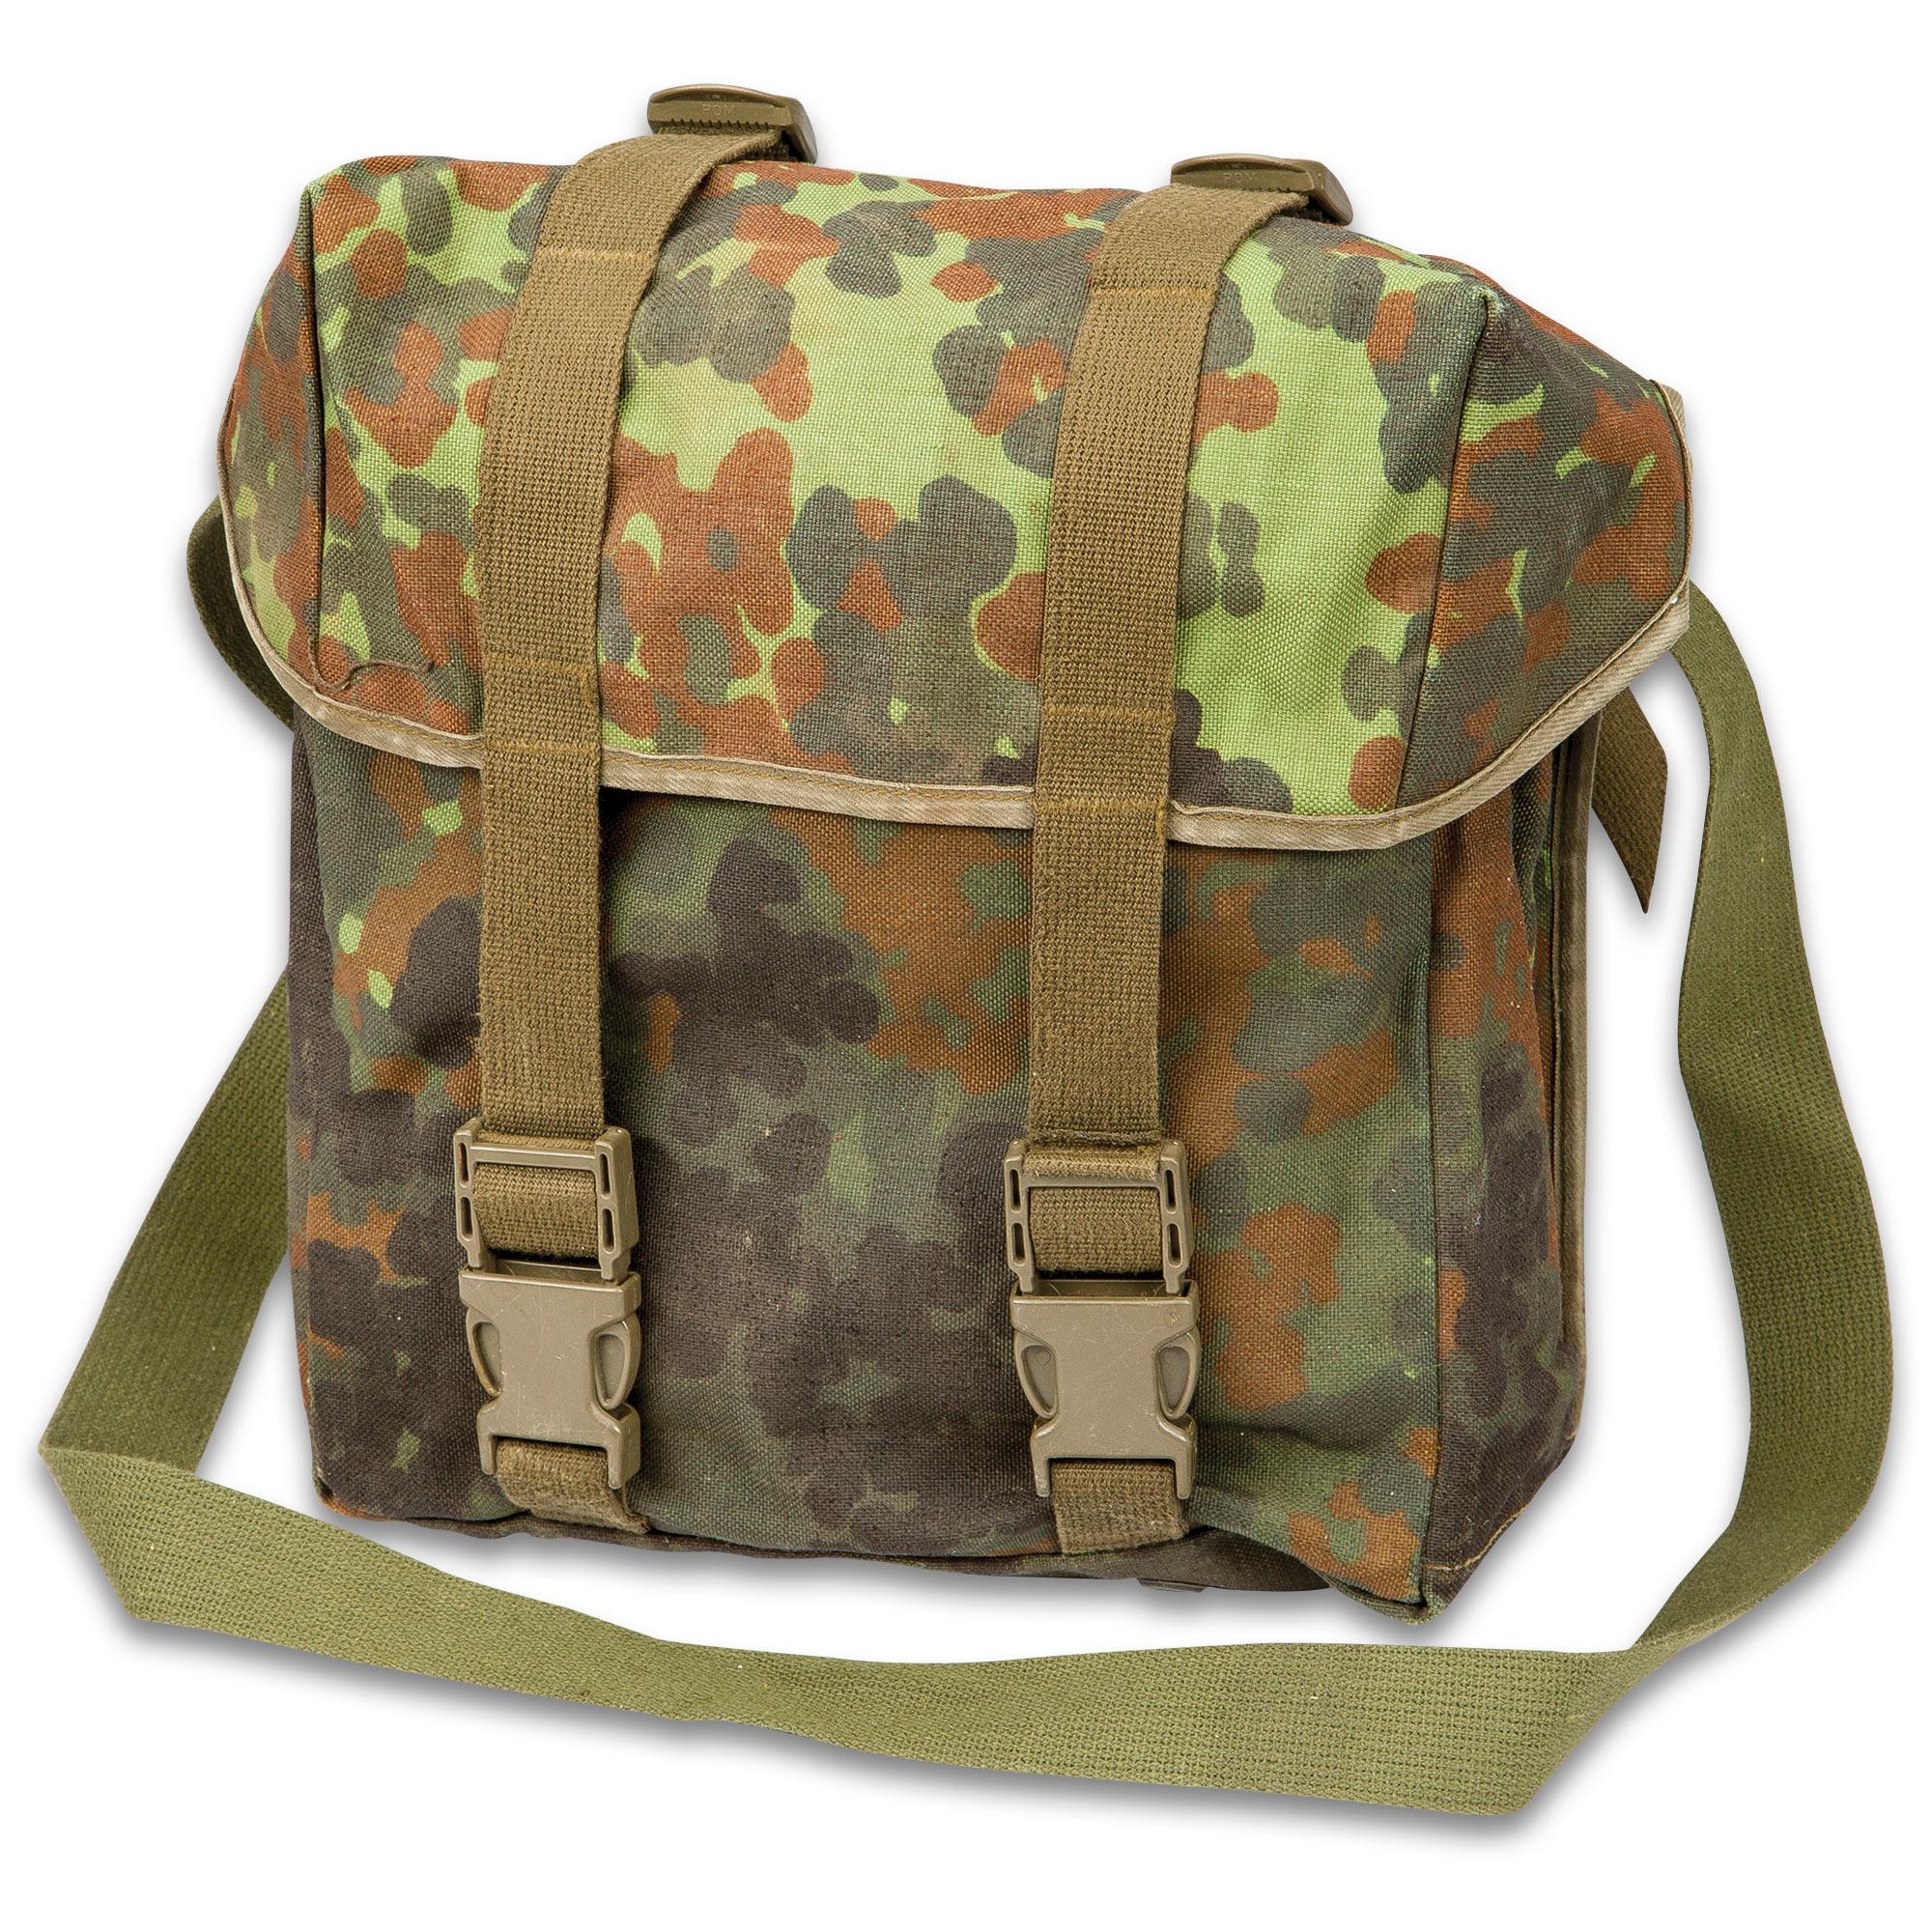 1a676352e German Military Surplus Combat Pack / Shoulder Bag - Flecktarn Camo ...